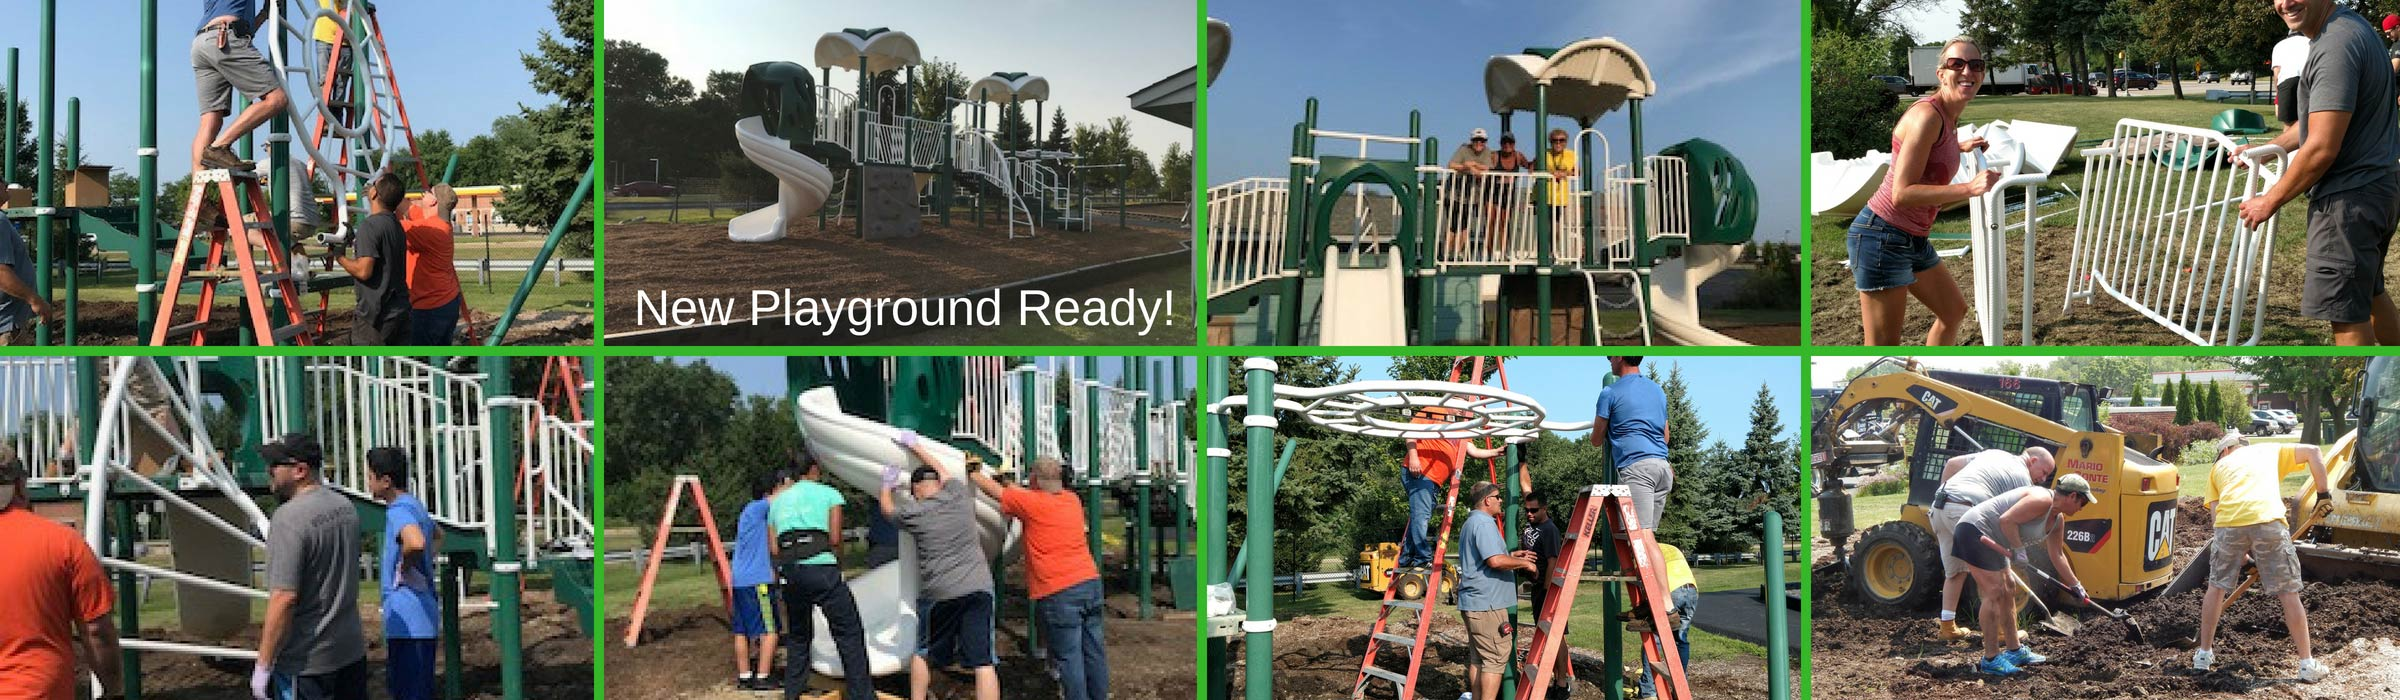 New-Playground-Ready!